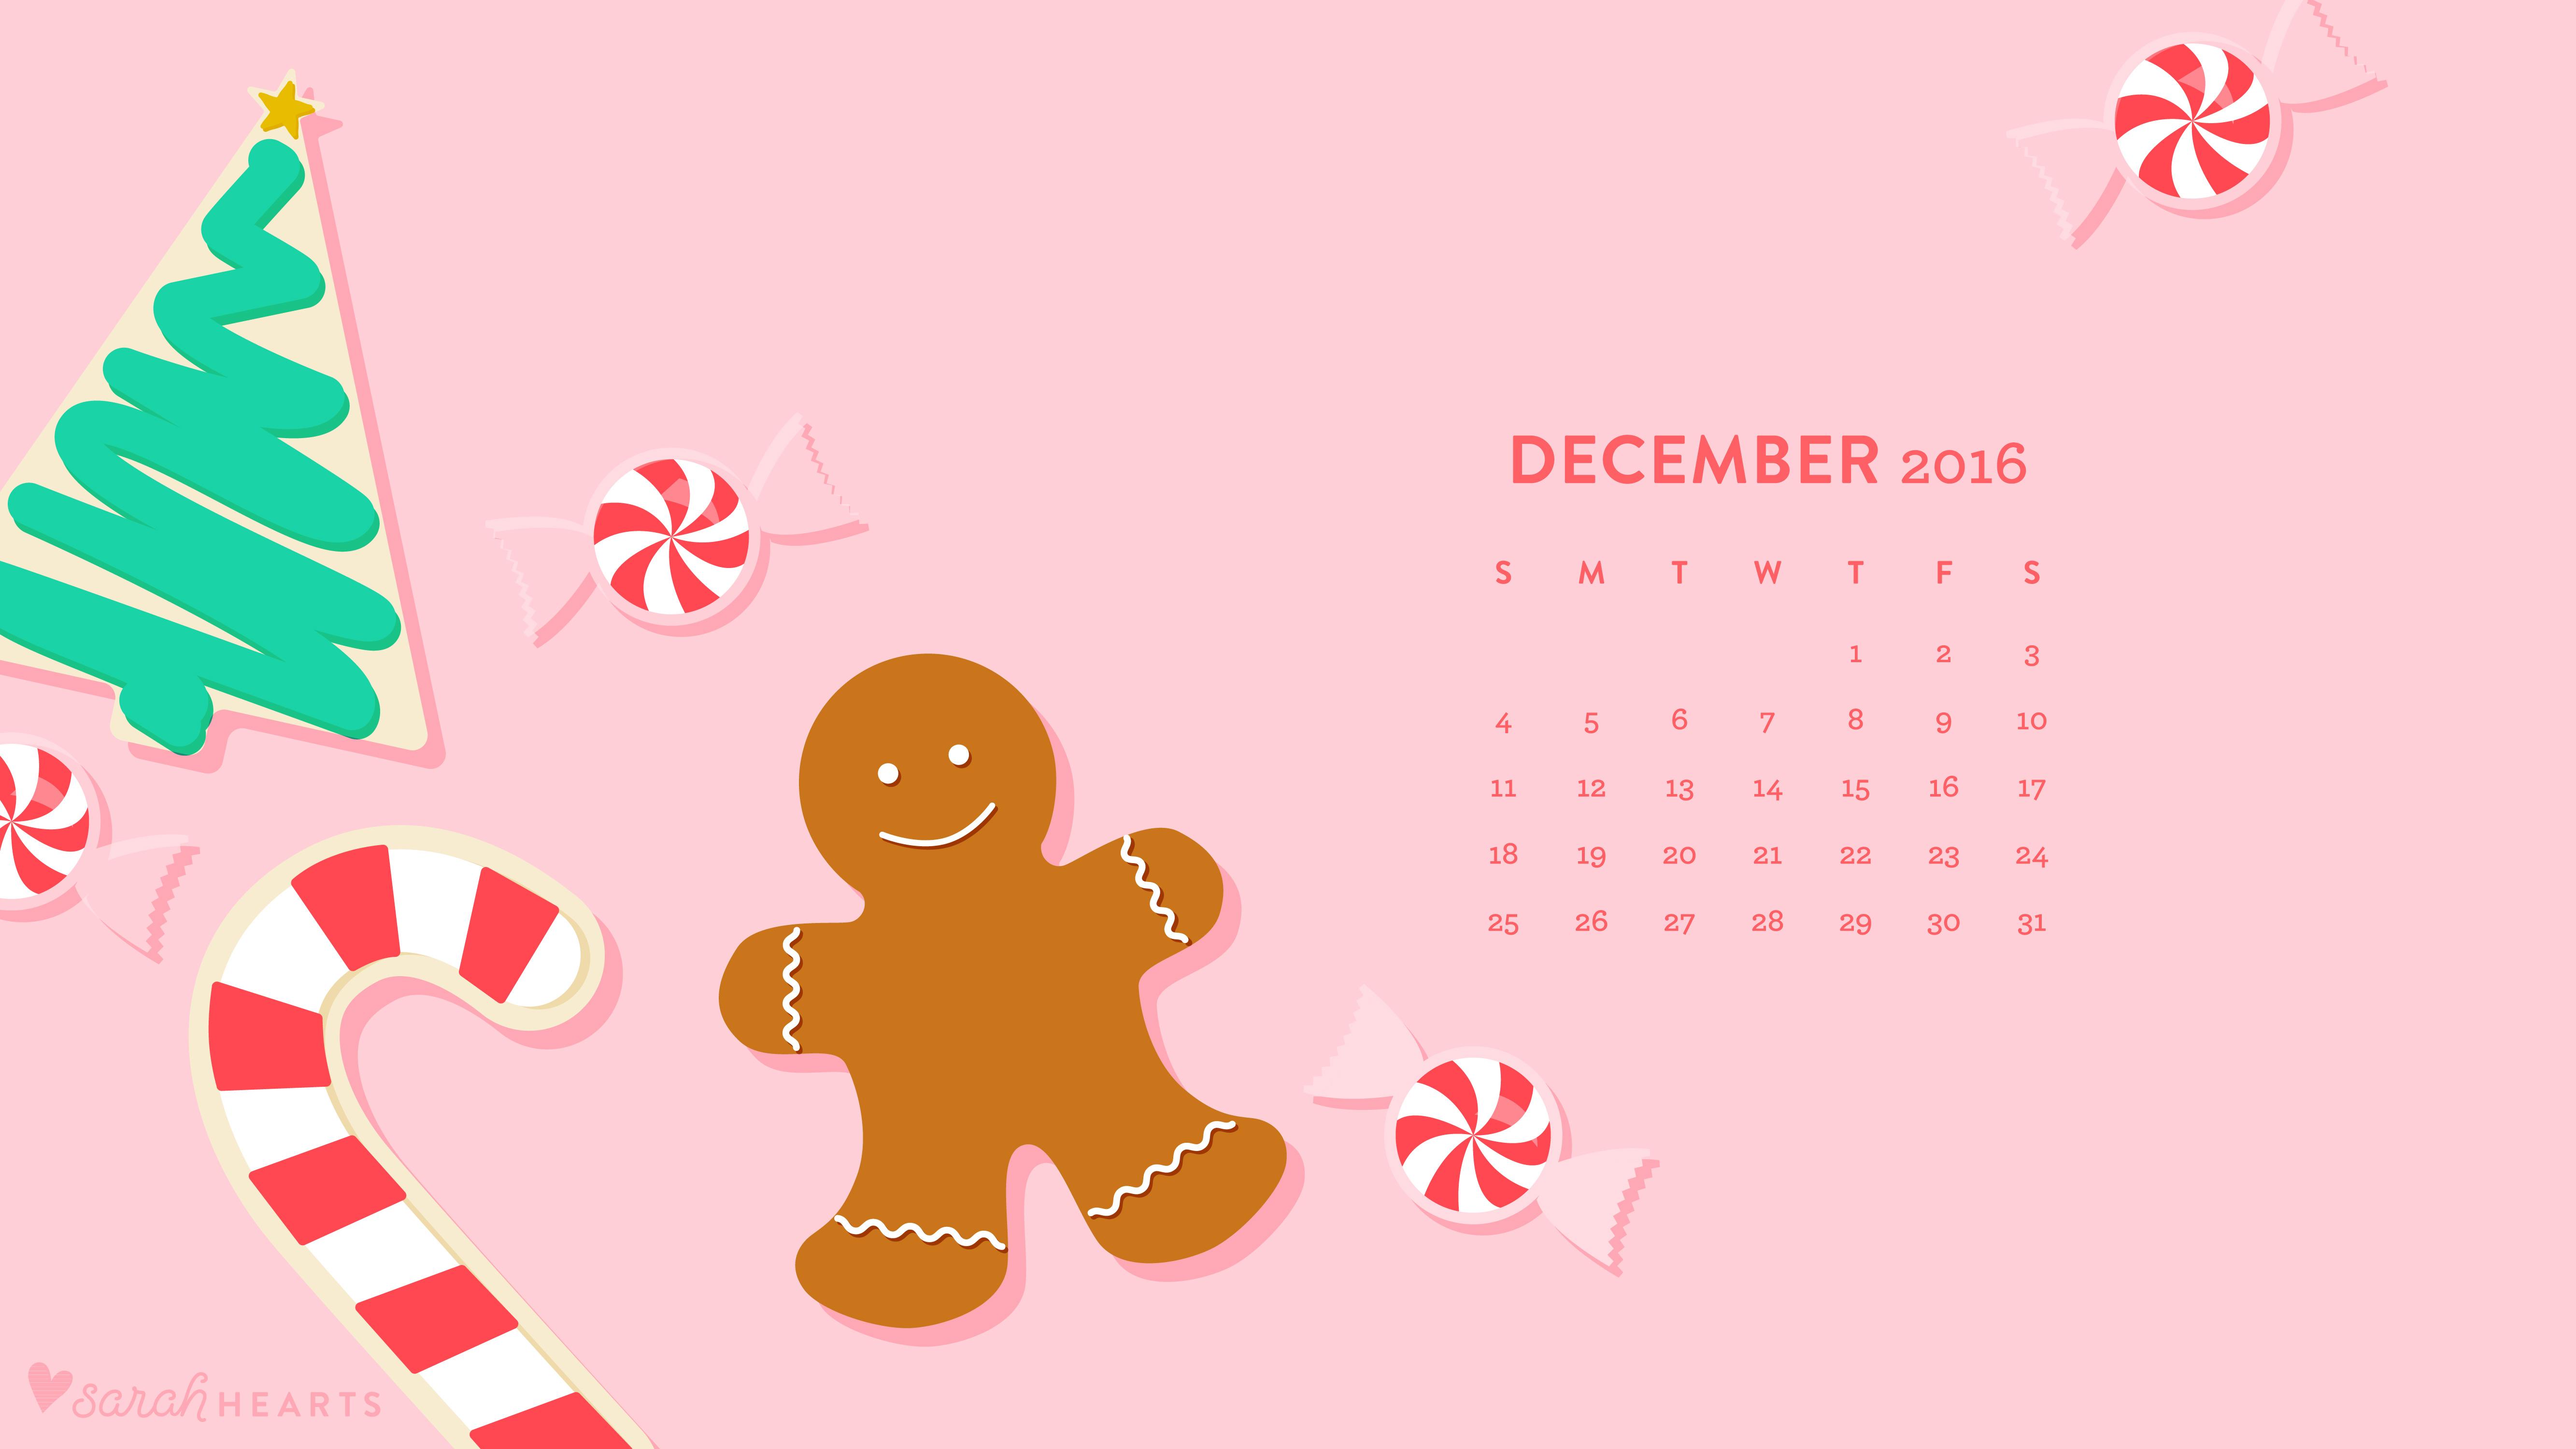 Cute Quote Wallpaper Download December 2016 Christmas Cookie Calendar Wallpaper Sarah